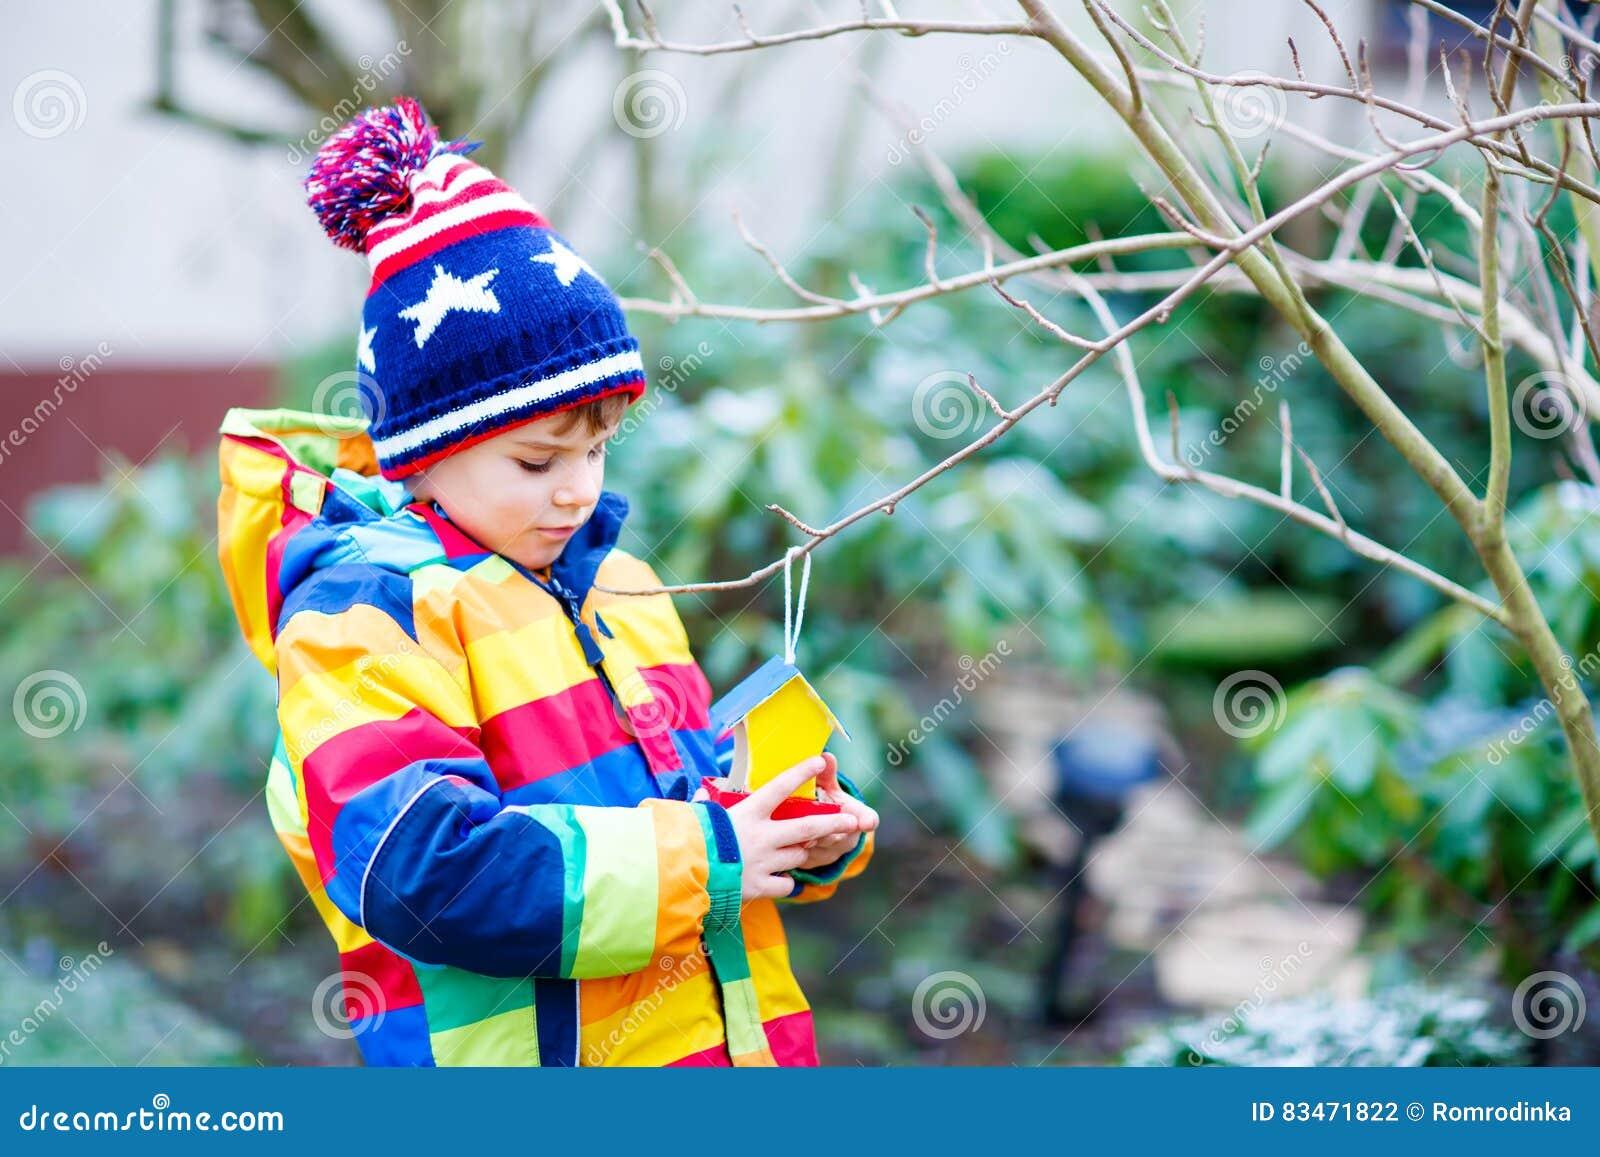 Groovy Little Kid Boy Hanging Bird House On Tree For Feeding In Download Free Architecture Designs Scobabritishbridgeorg